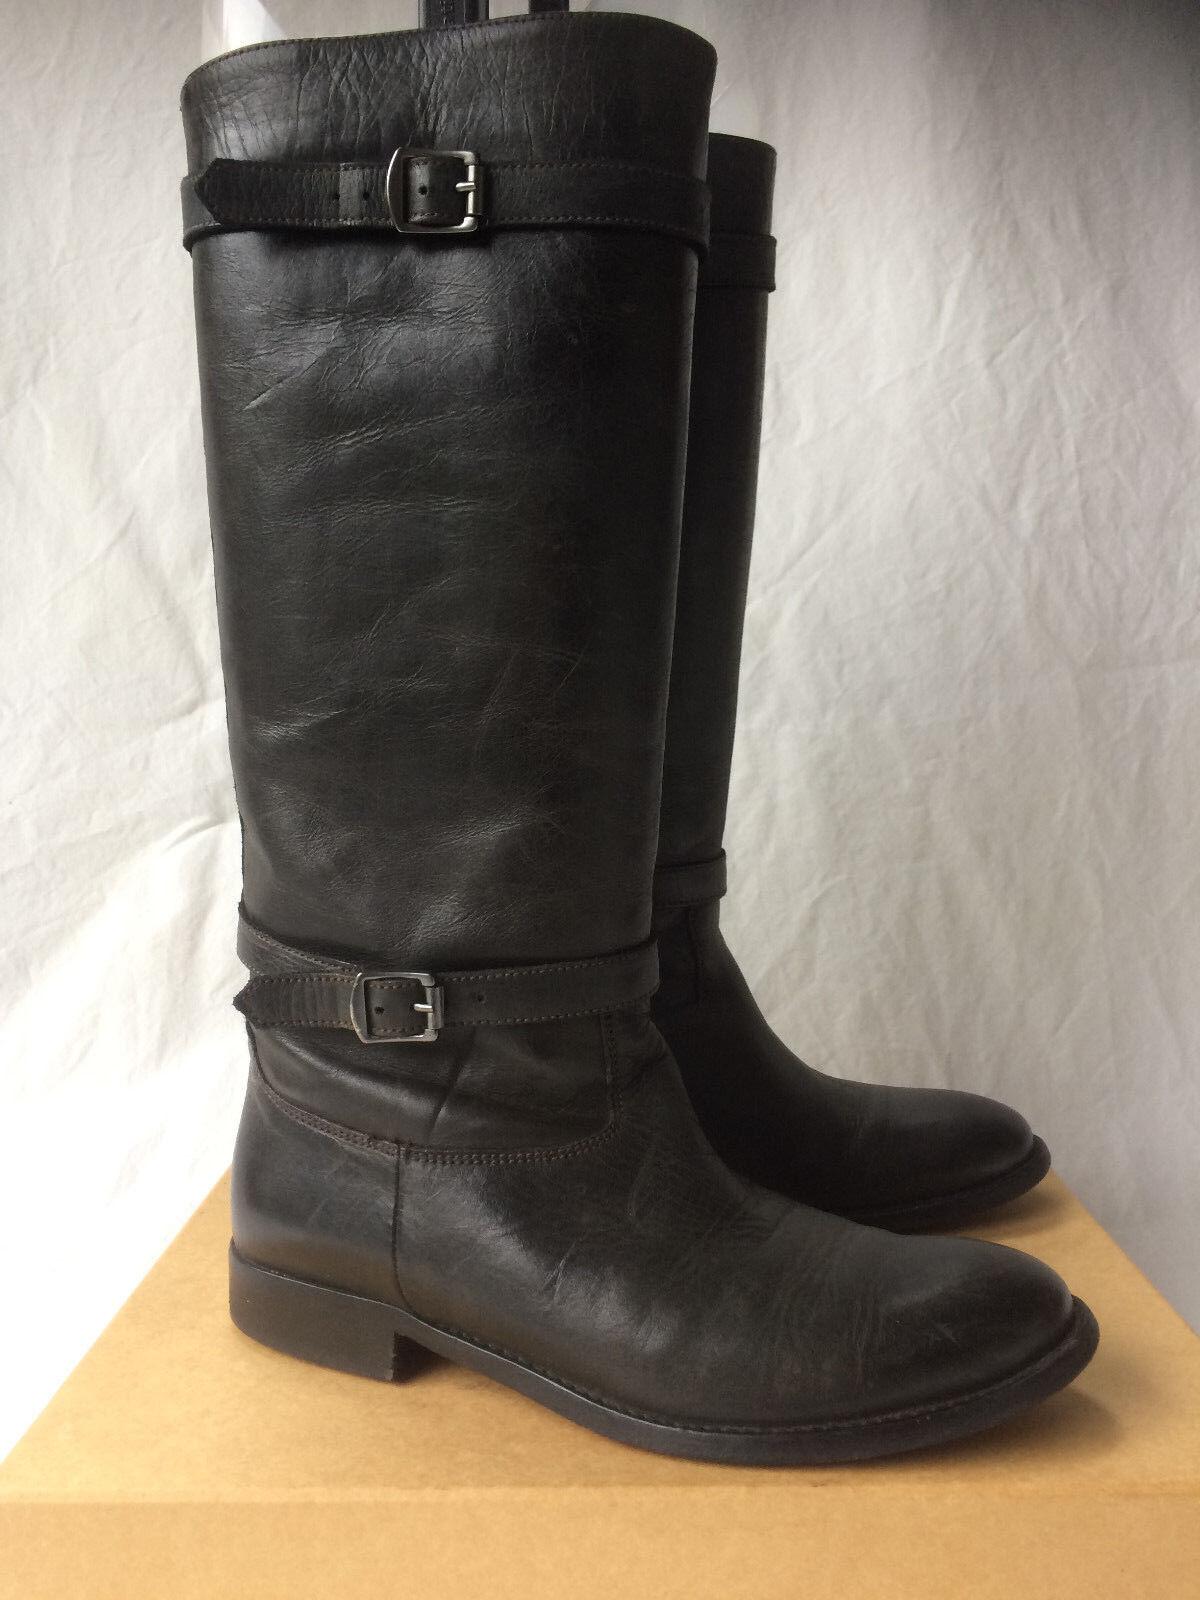 Belstaff Shannon Bottes Femmes bottes. taille 37. UK 5. Cuir. Noir.